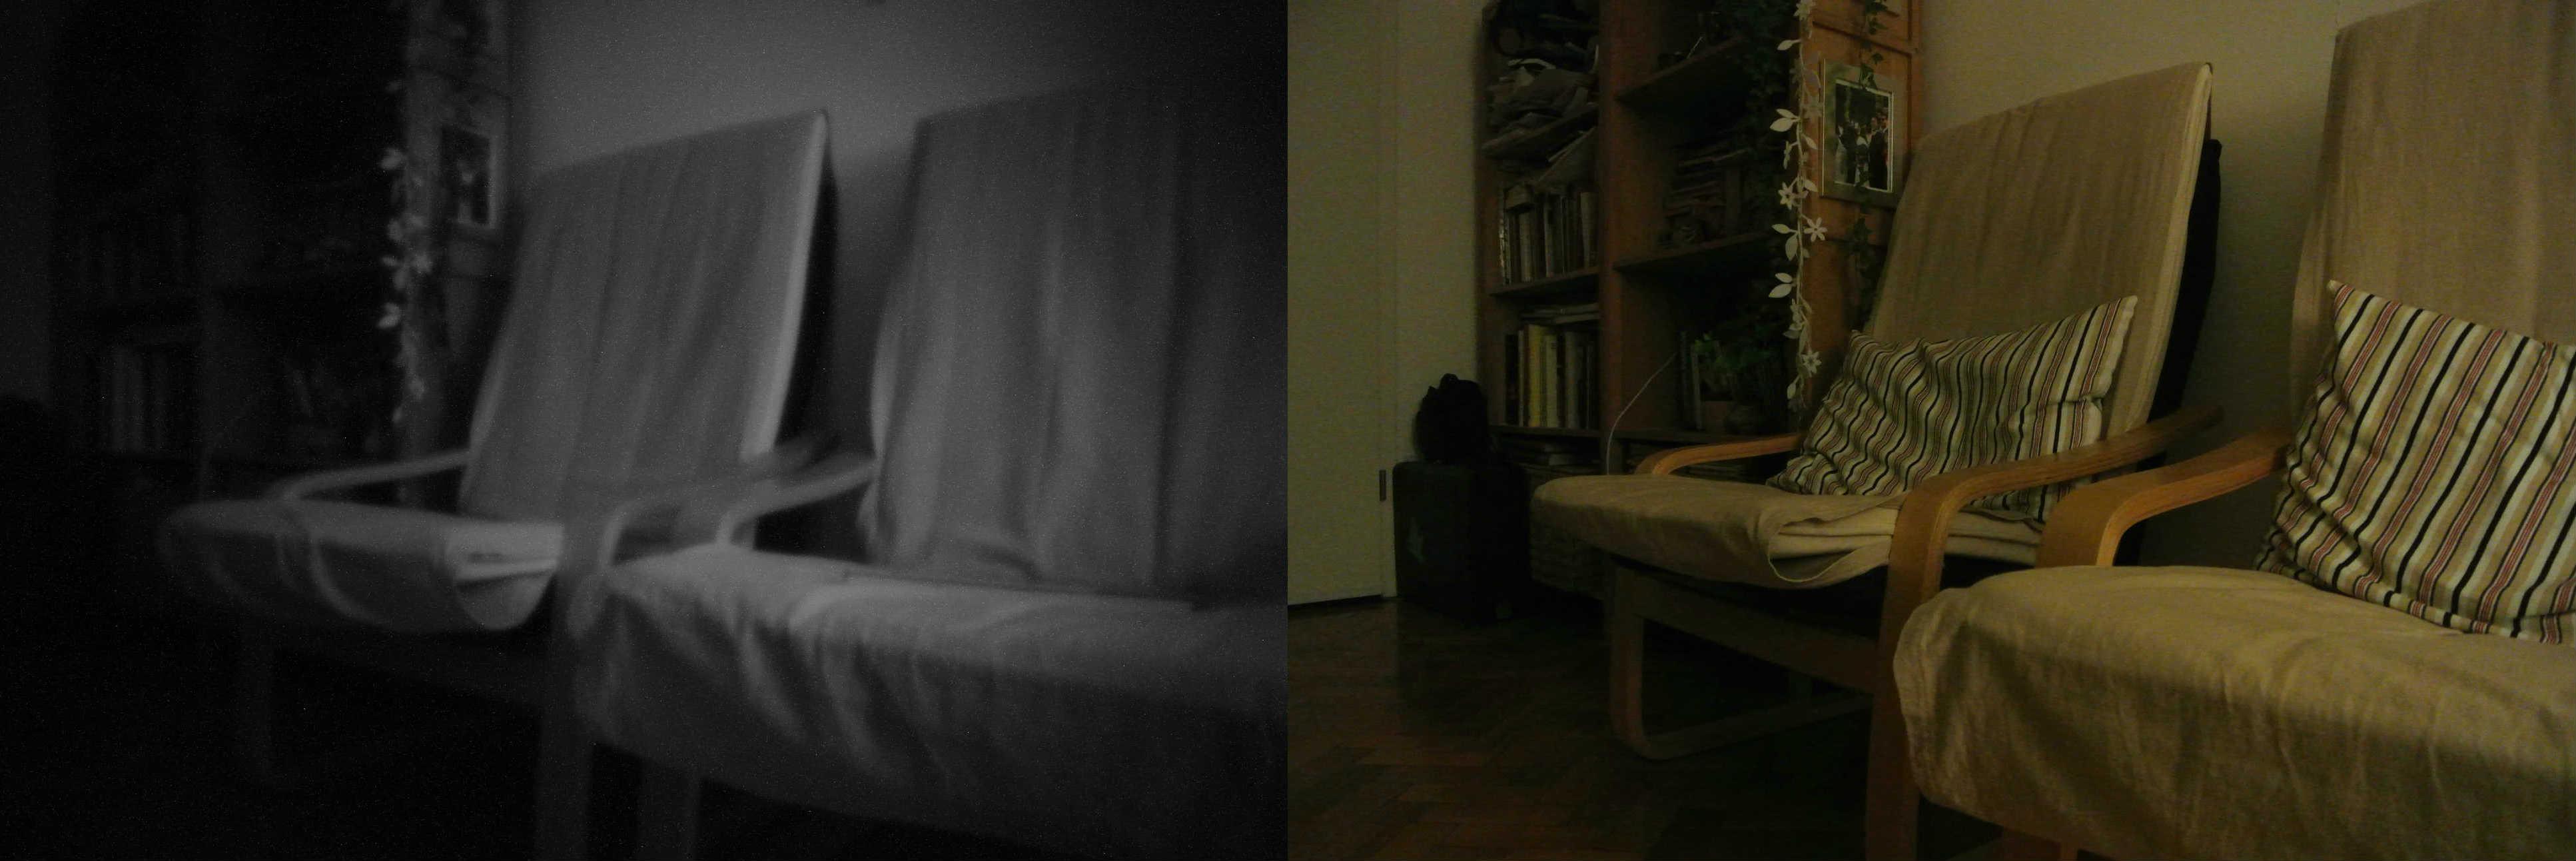 pikon vs. 10 mm Nikon J1